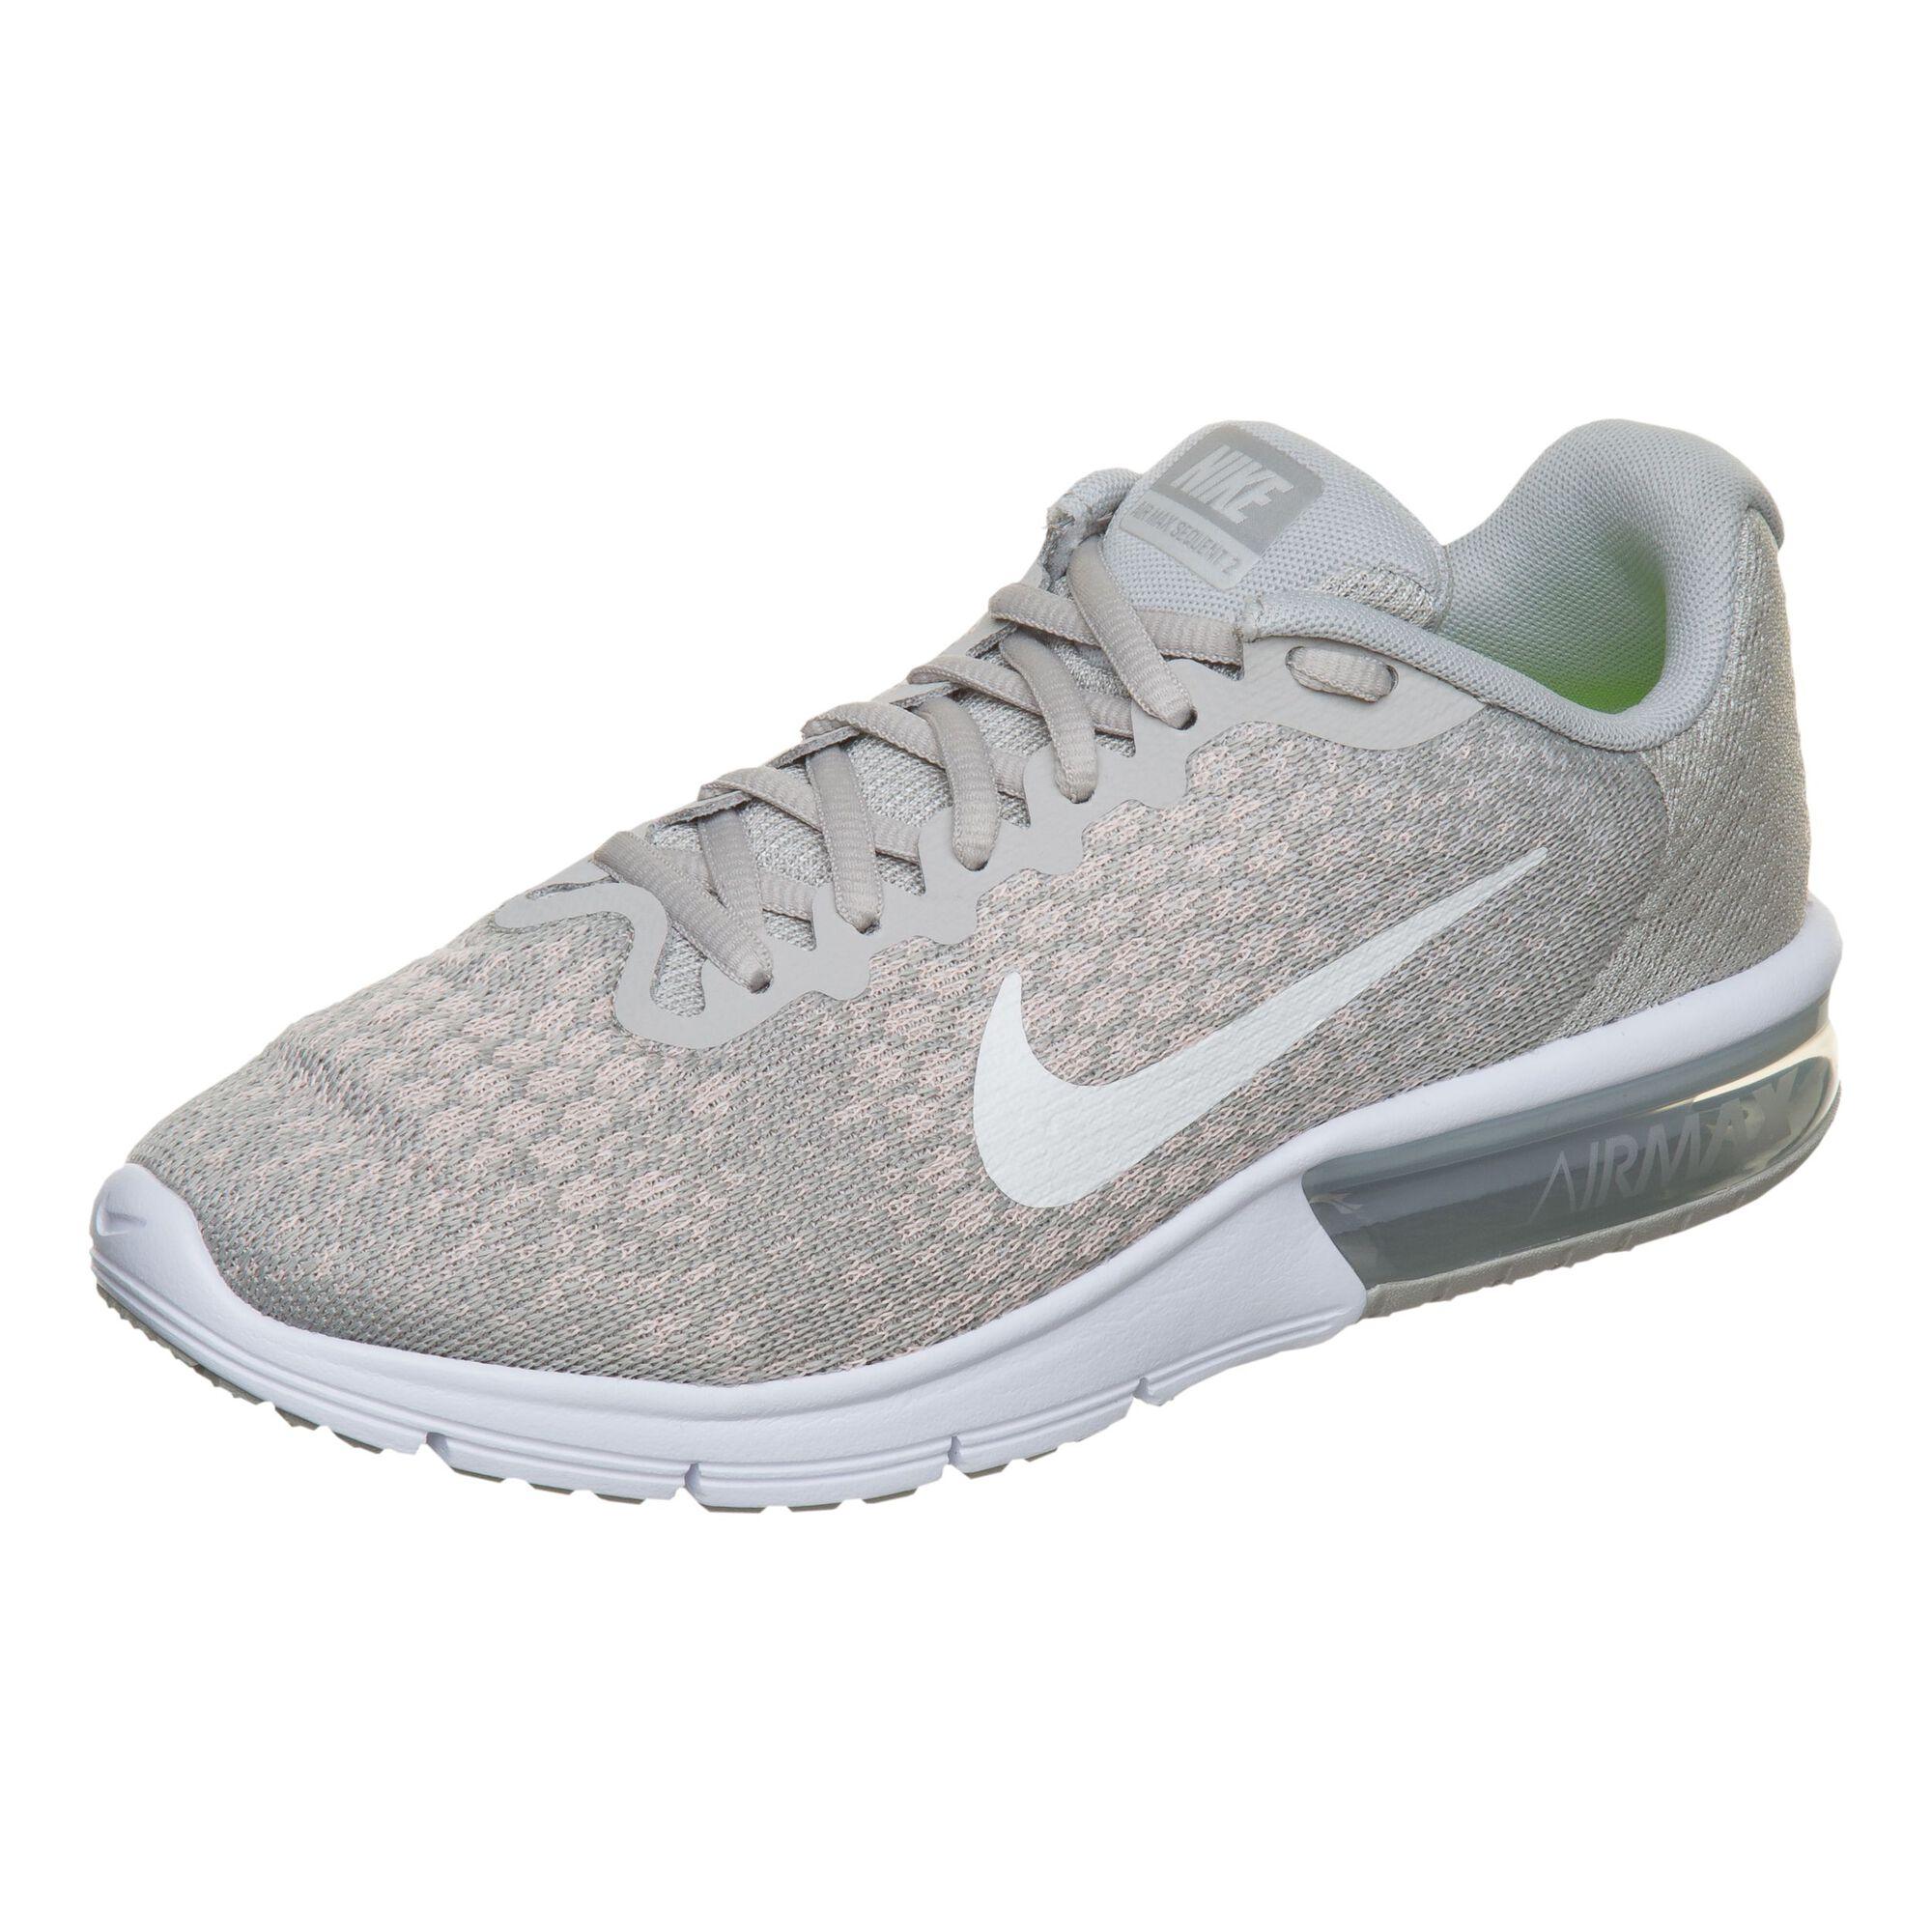 timeless design 111d1 b9256 Nike  Nike  Nike  Nike  Nike  Nike  Nike  Nike  Nike  Nike. Air Max Sequent  2 ...